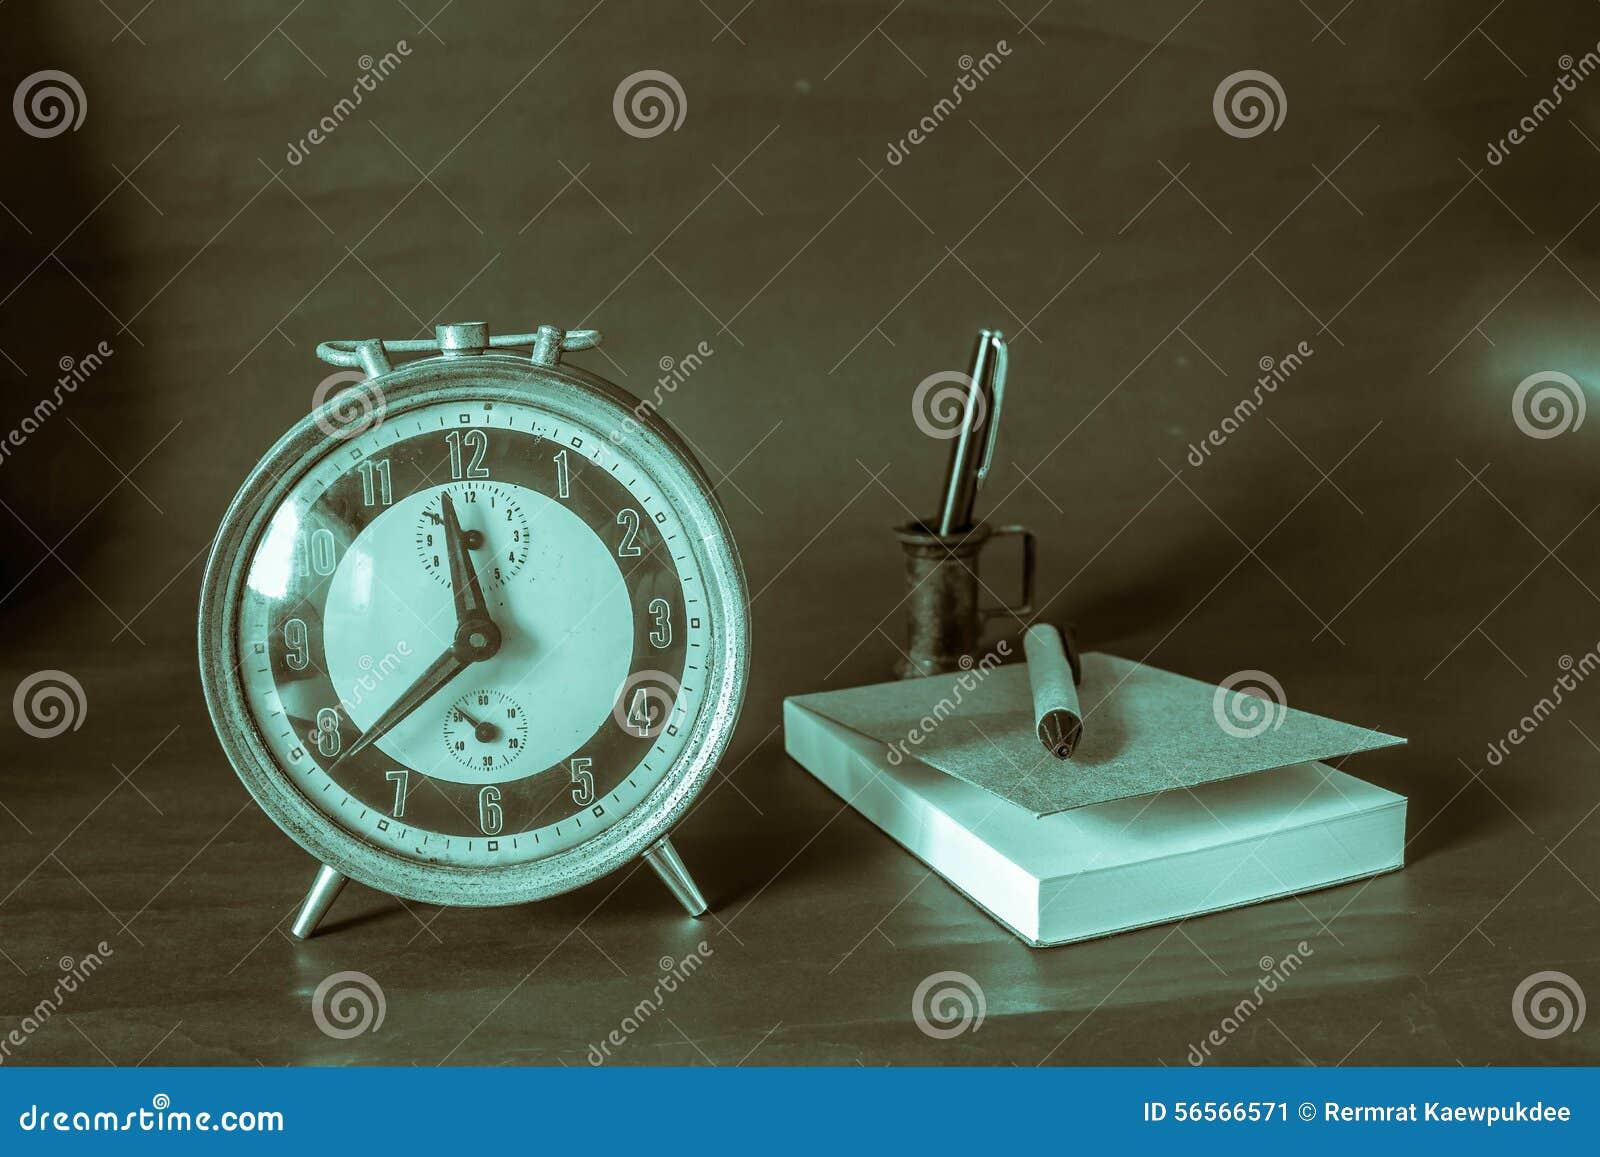 Download Ρολόι και γράψιμο στο υπόβαθρο Στοκ Εικόνα - εικόνα από ρολόι, εταιρικός: 56566571